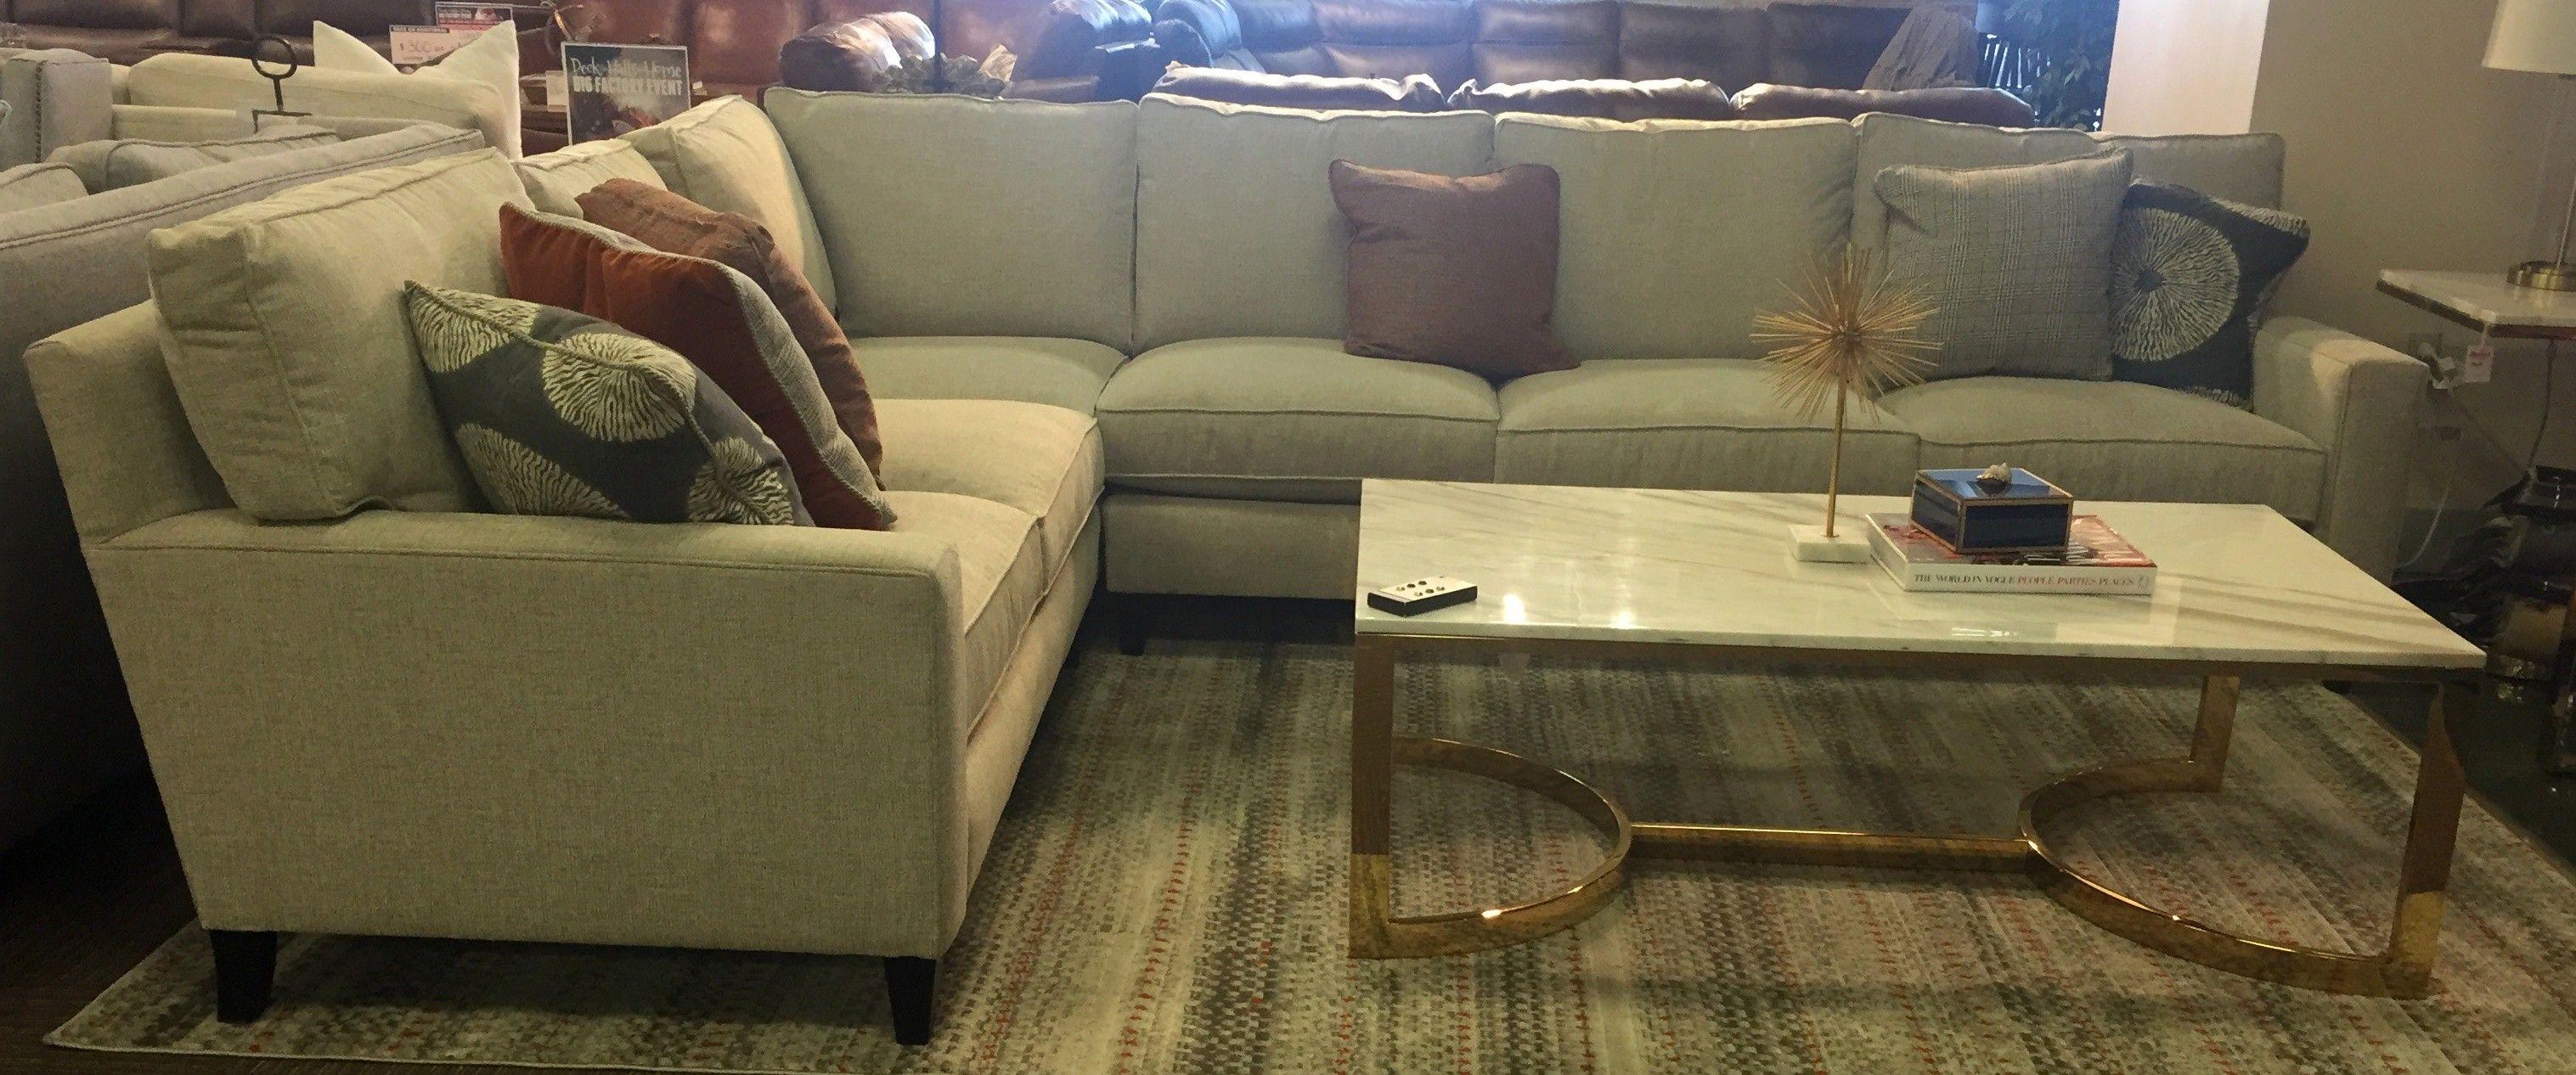 Excellent Germain Sectional By Bernhardt Furniture By Watsons Frankydiablos Diy Chair Ideas Frankydiabloscom